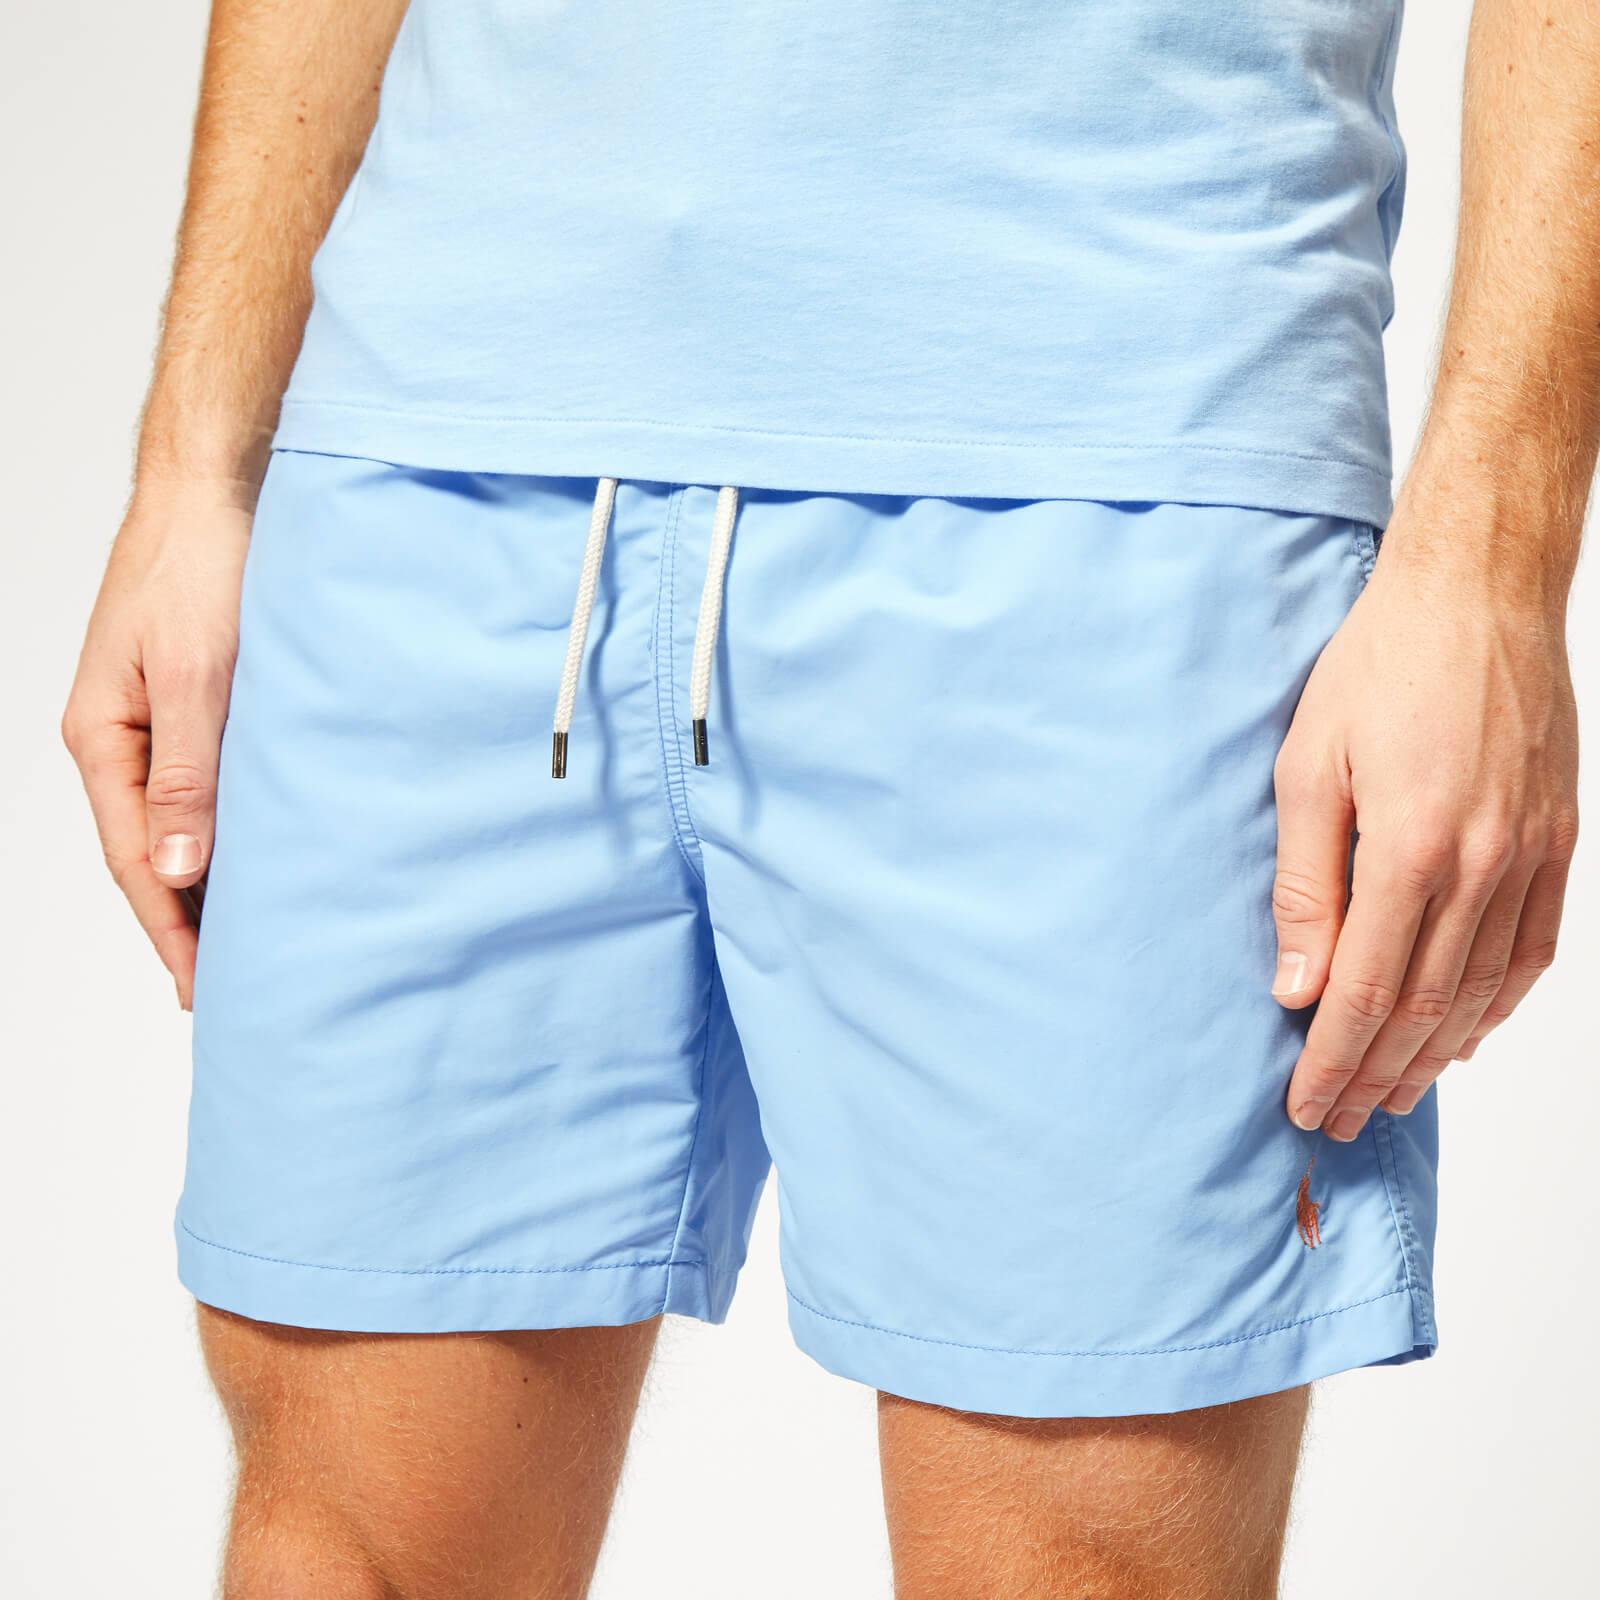 fd2f99456 Polo Ralph Lauren Men s Traveller Swim Shorts - Baby Blue - Free UK  Delivery over £50